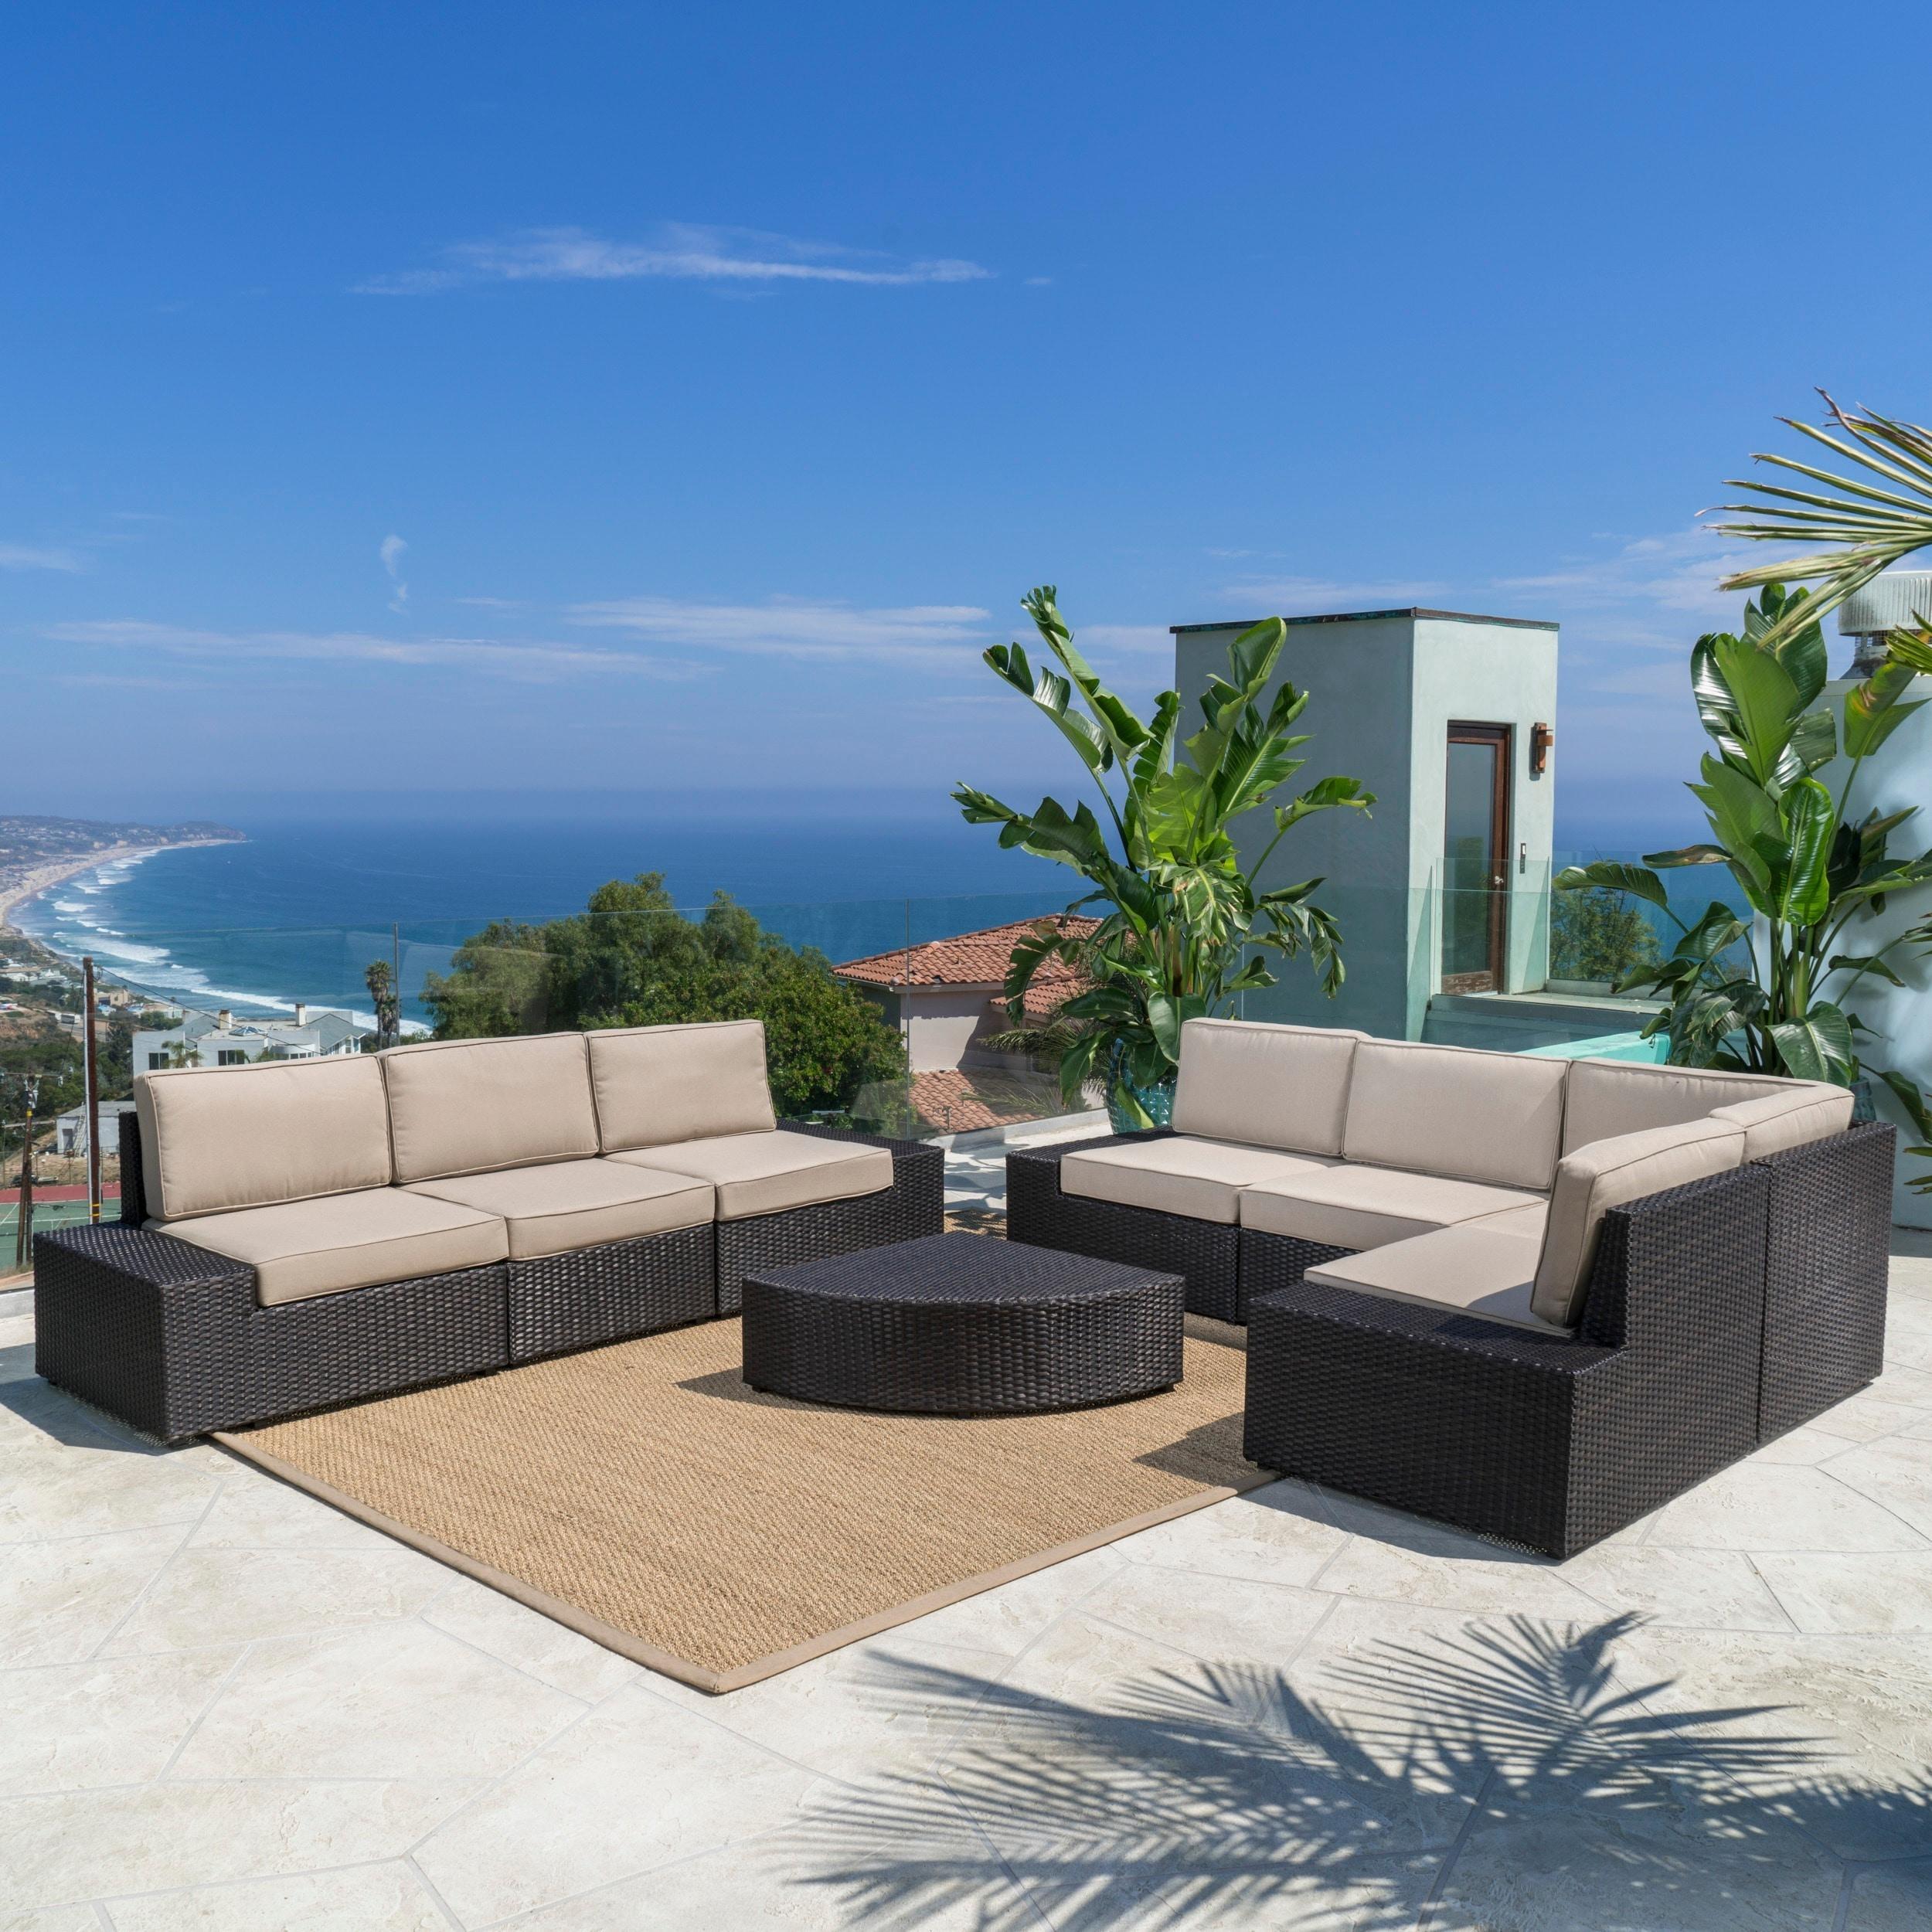 Shop Santa Cruz Outdoor 8 Piece Wicker Sectional Sofa Set With